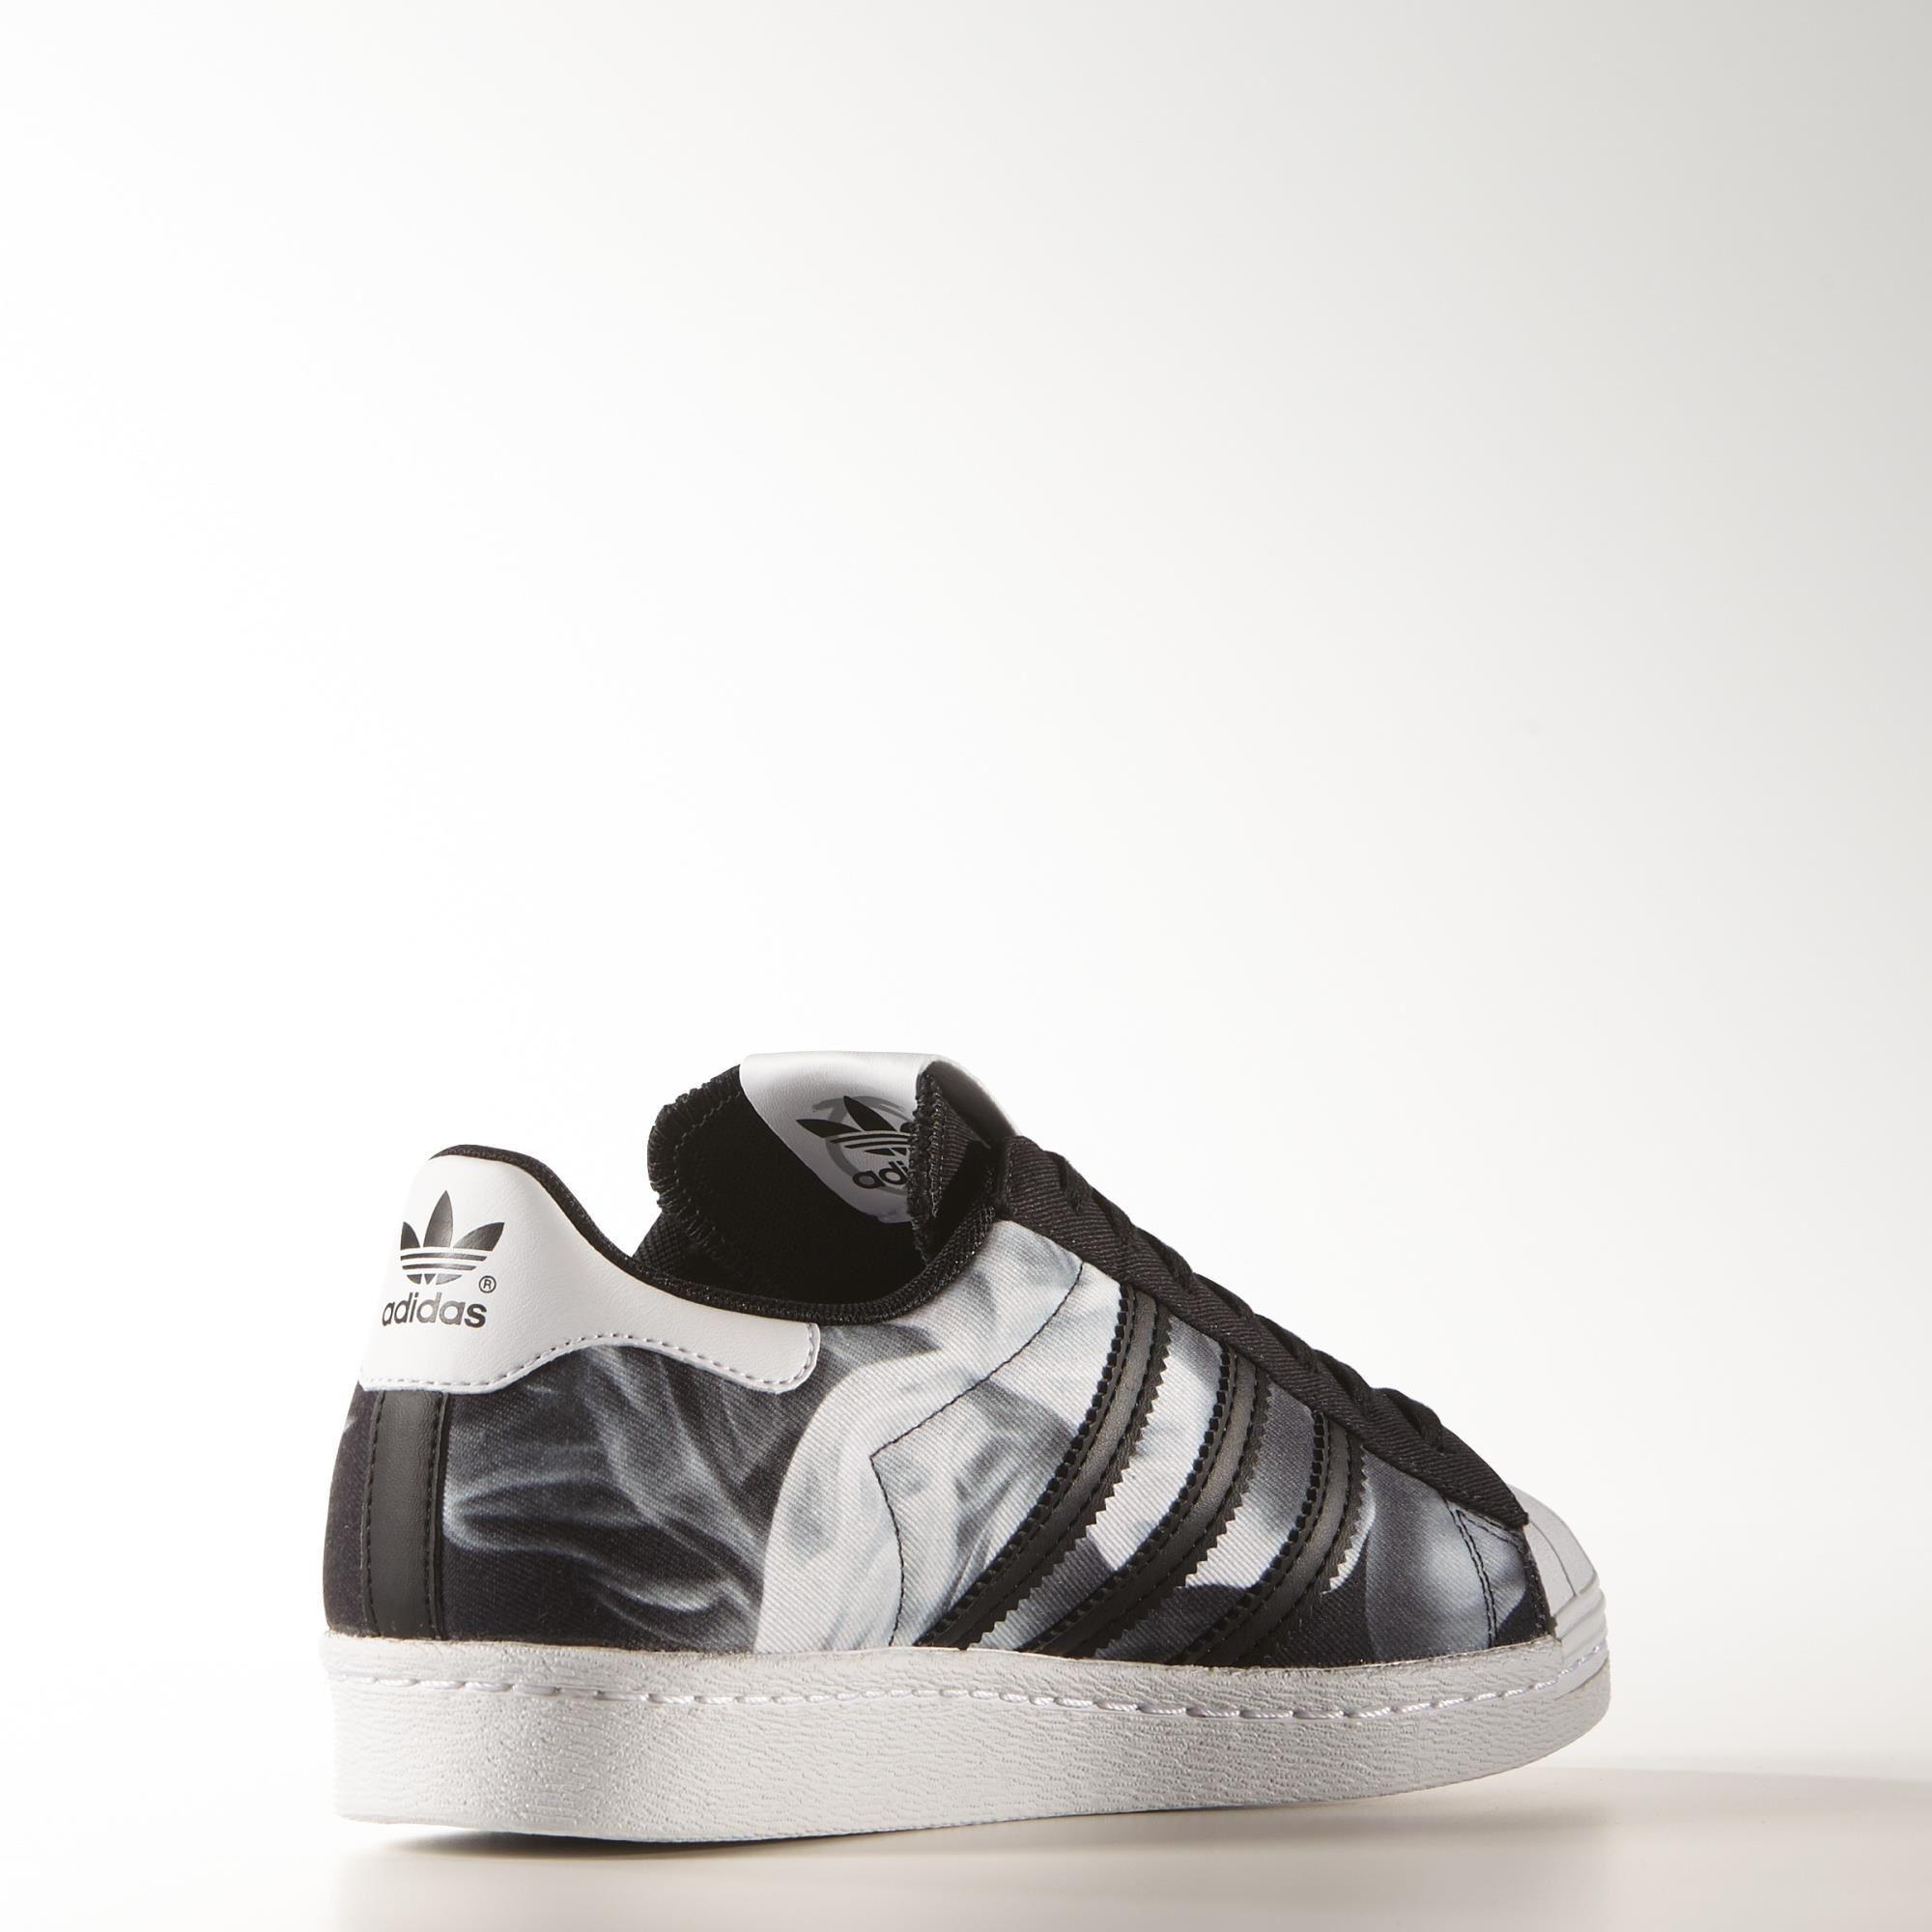 adidas superstar degli anni '80 le scarpe hemd scarpe pinterest superstar